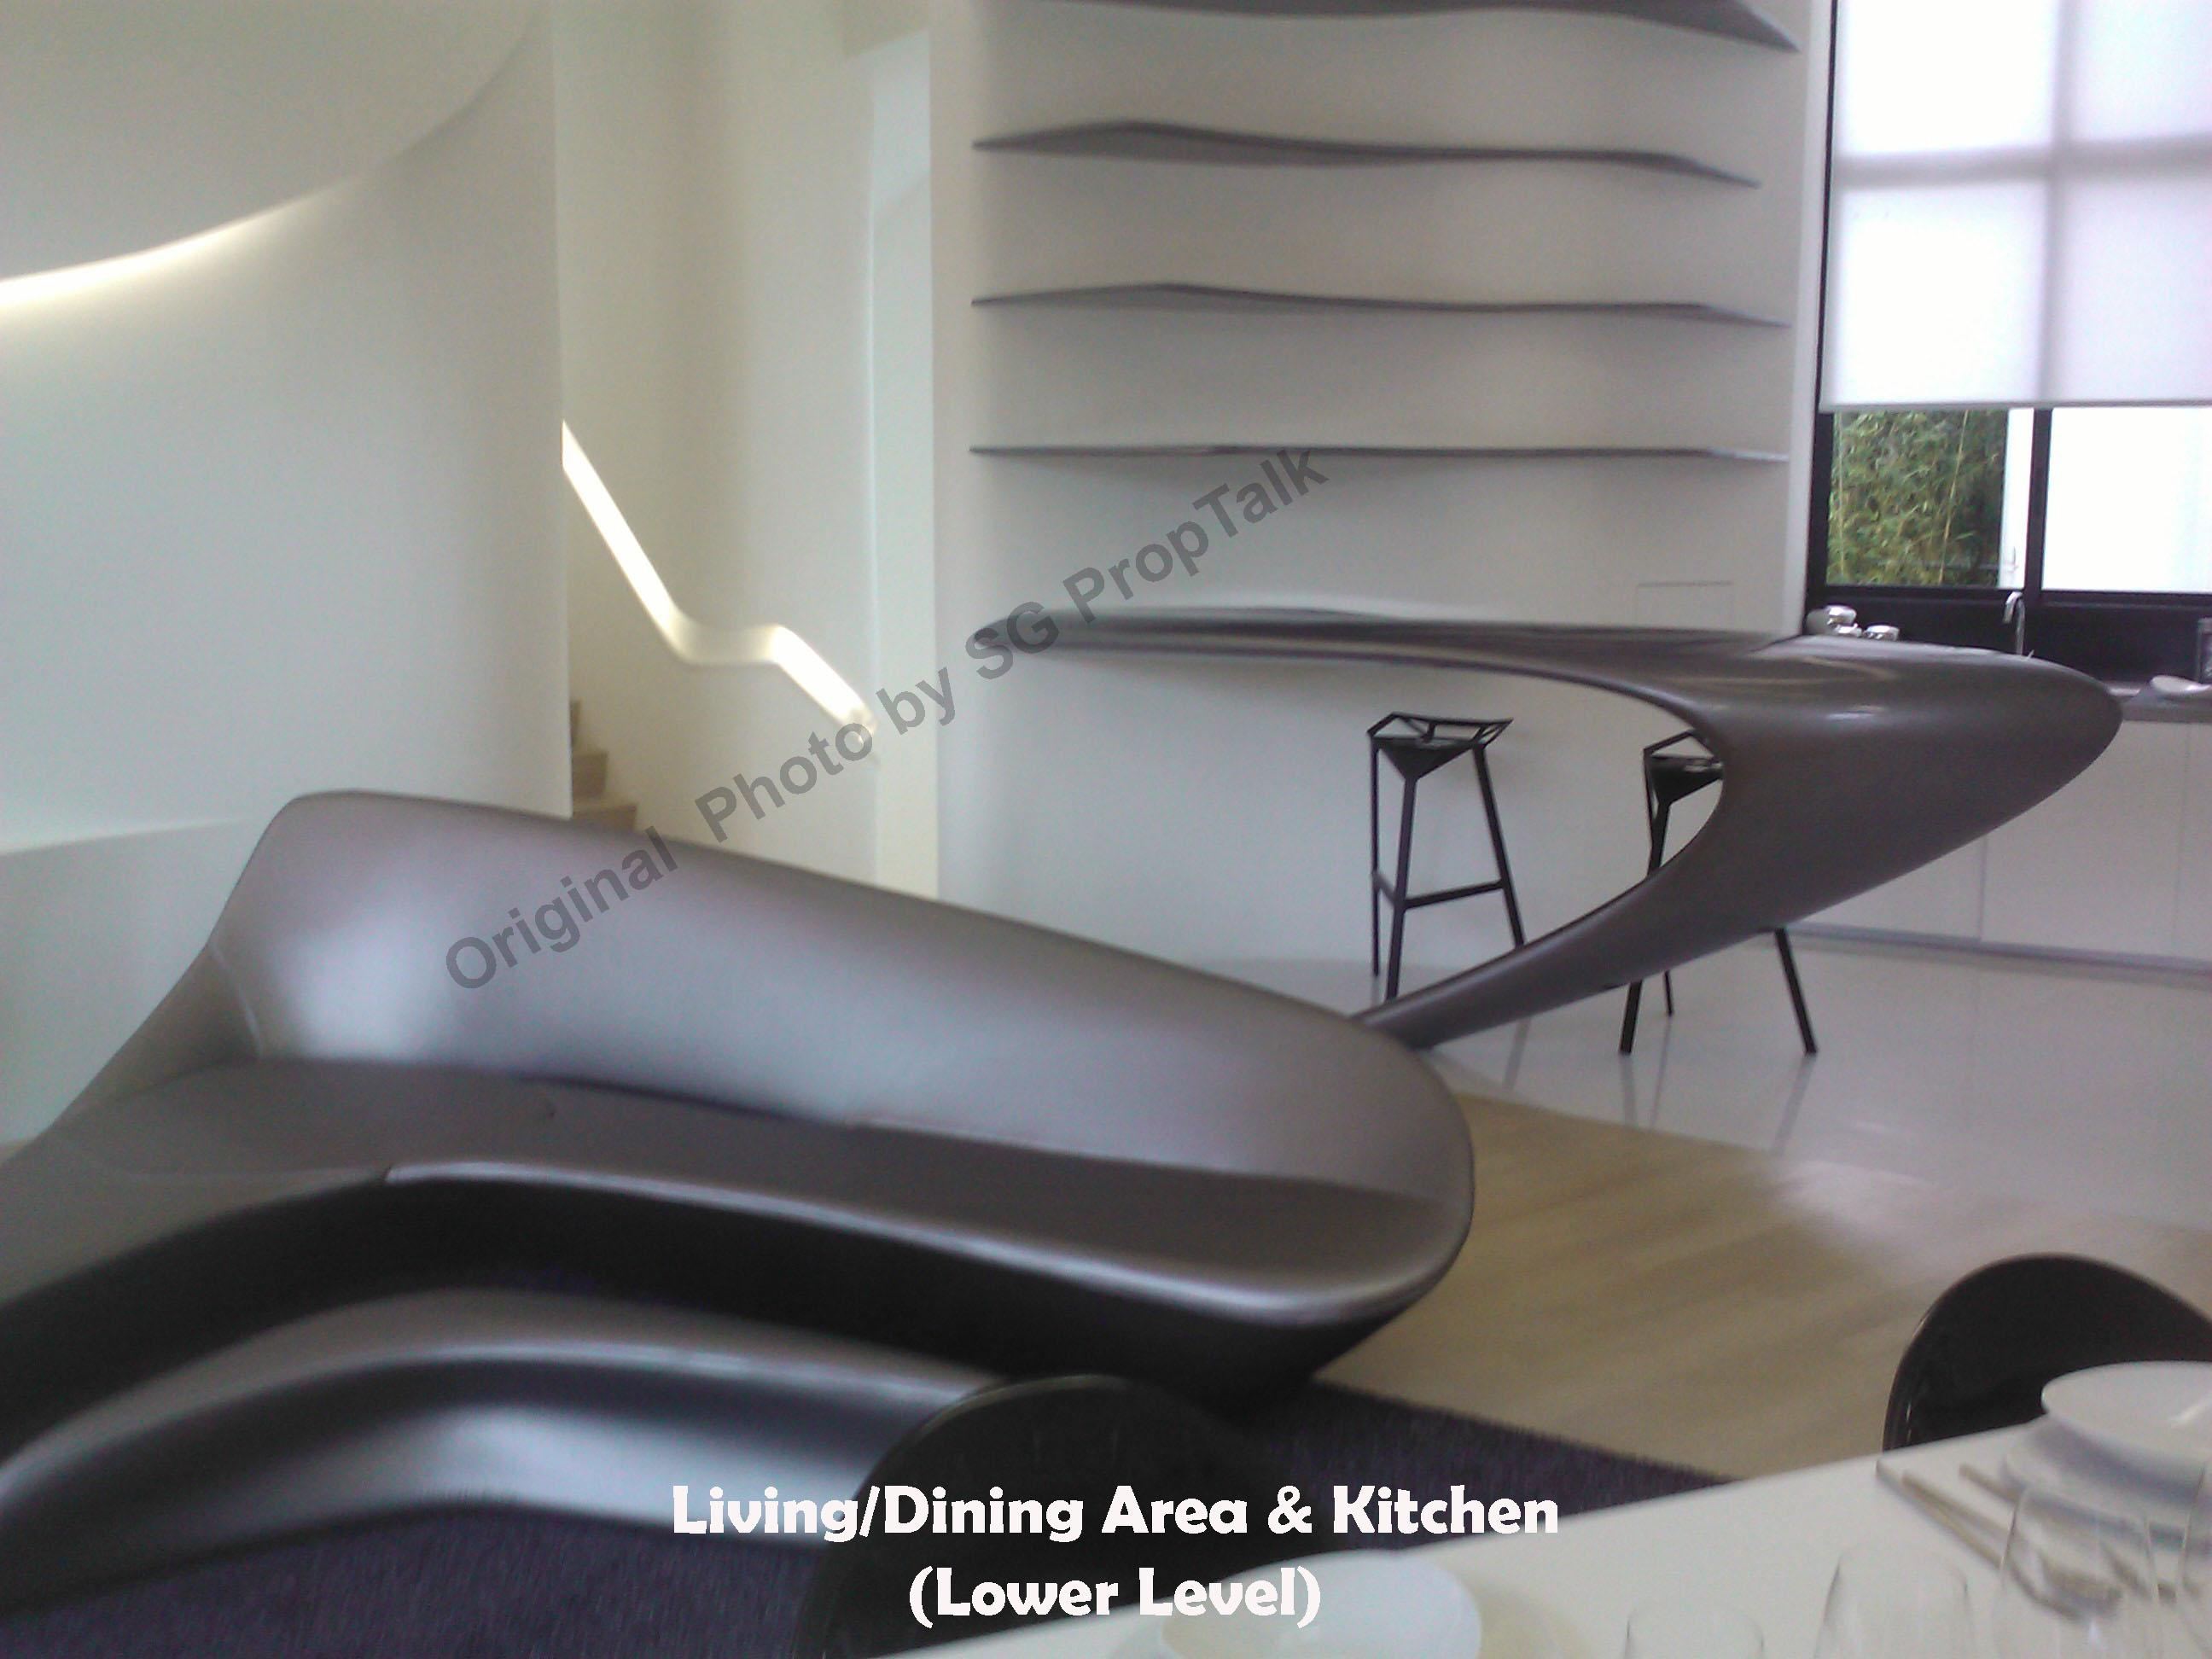 Garden villas at d leedon - Living Kitchen